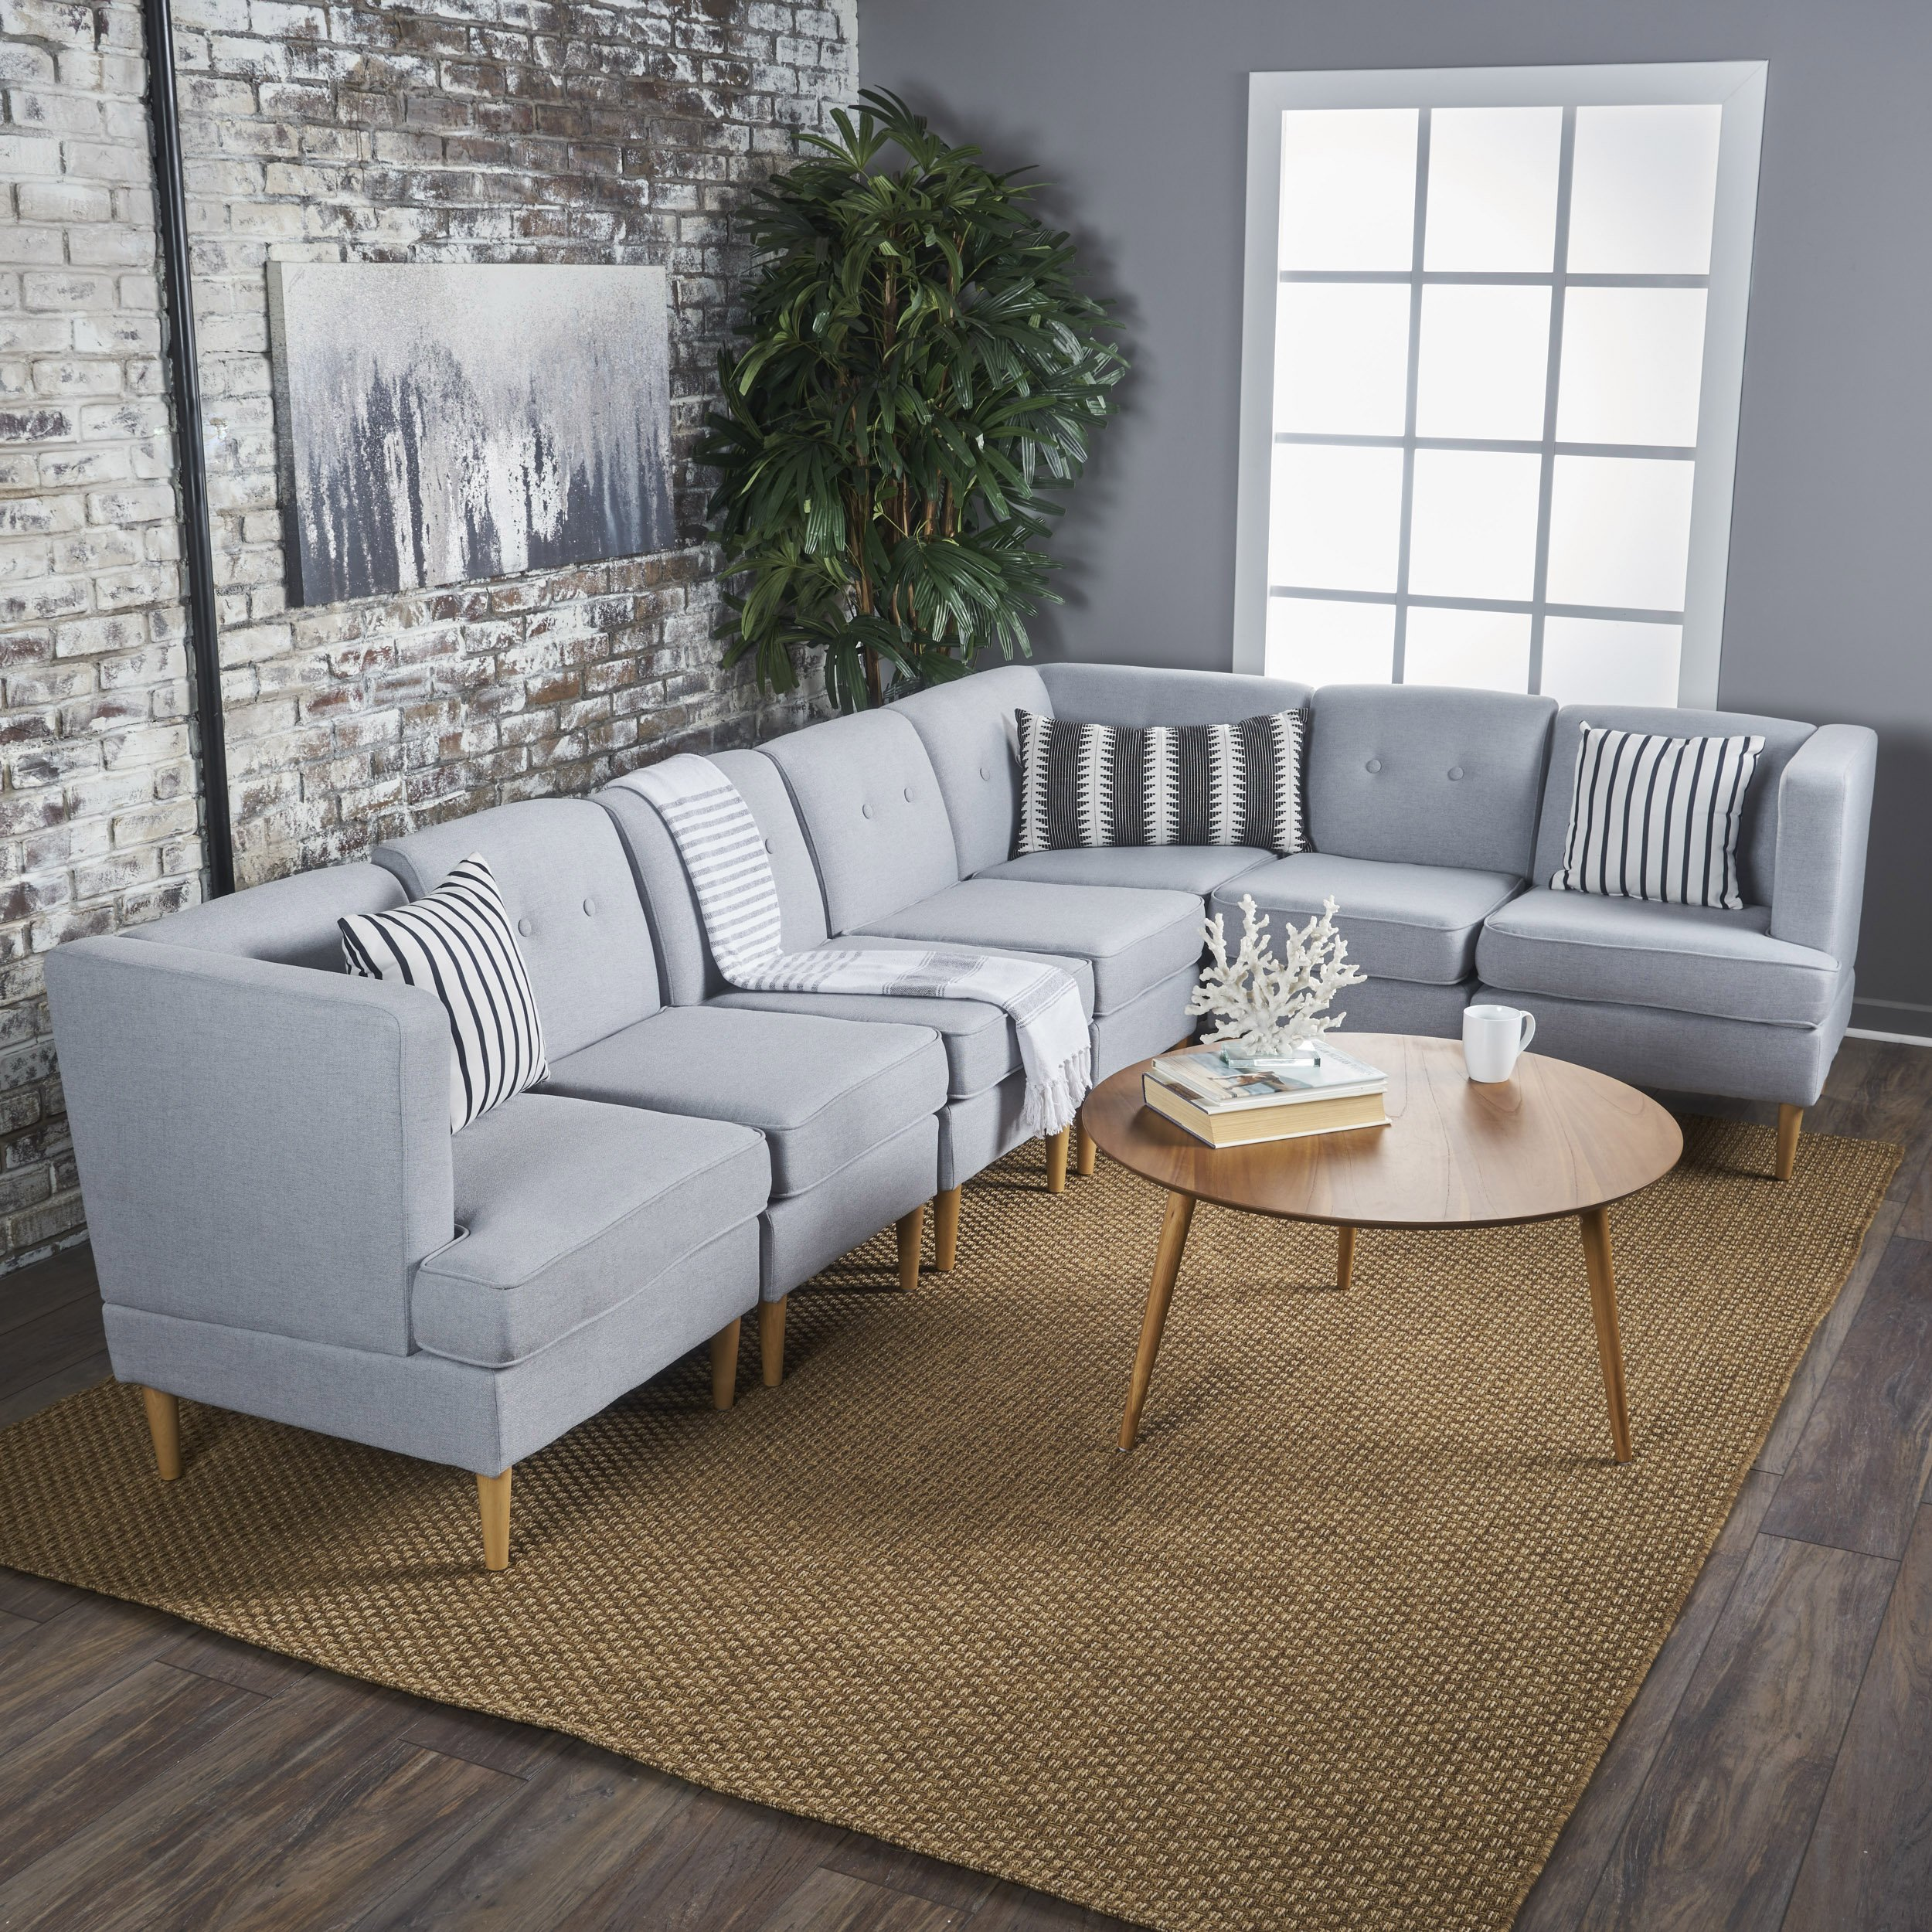 Milltown Mid Century Modern Fabric 7 Piece Sectional Sofa Set (Light Grey)